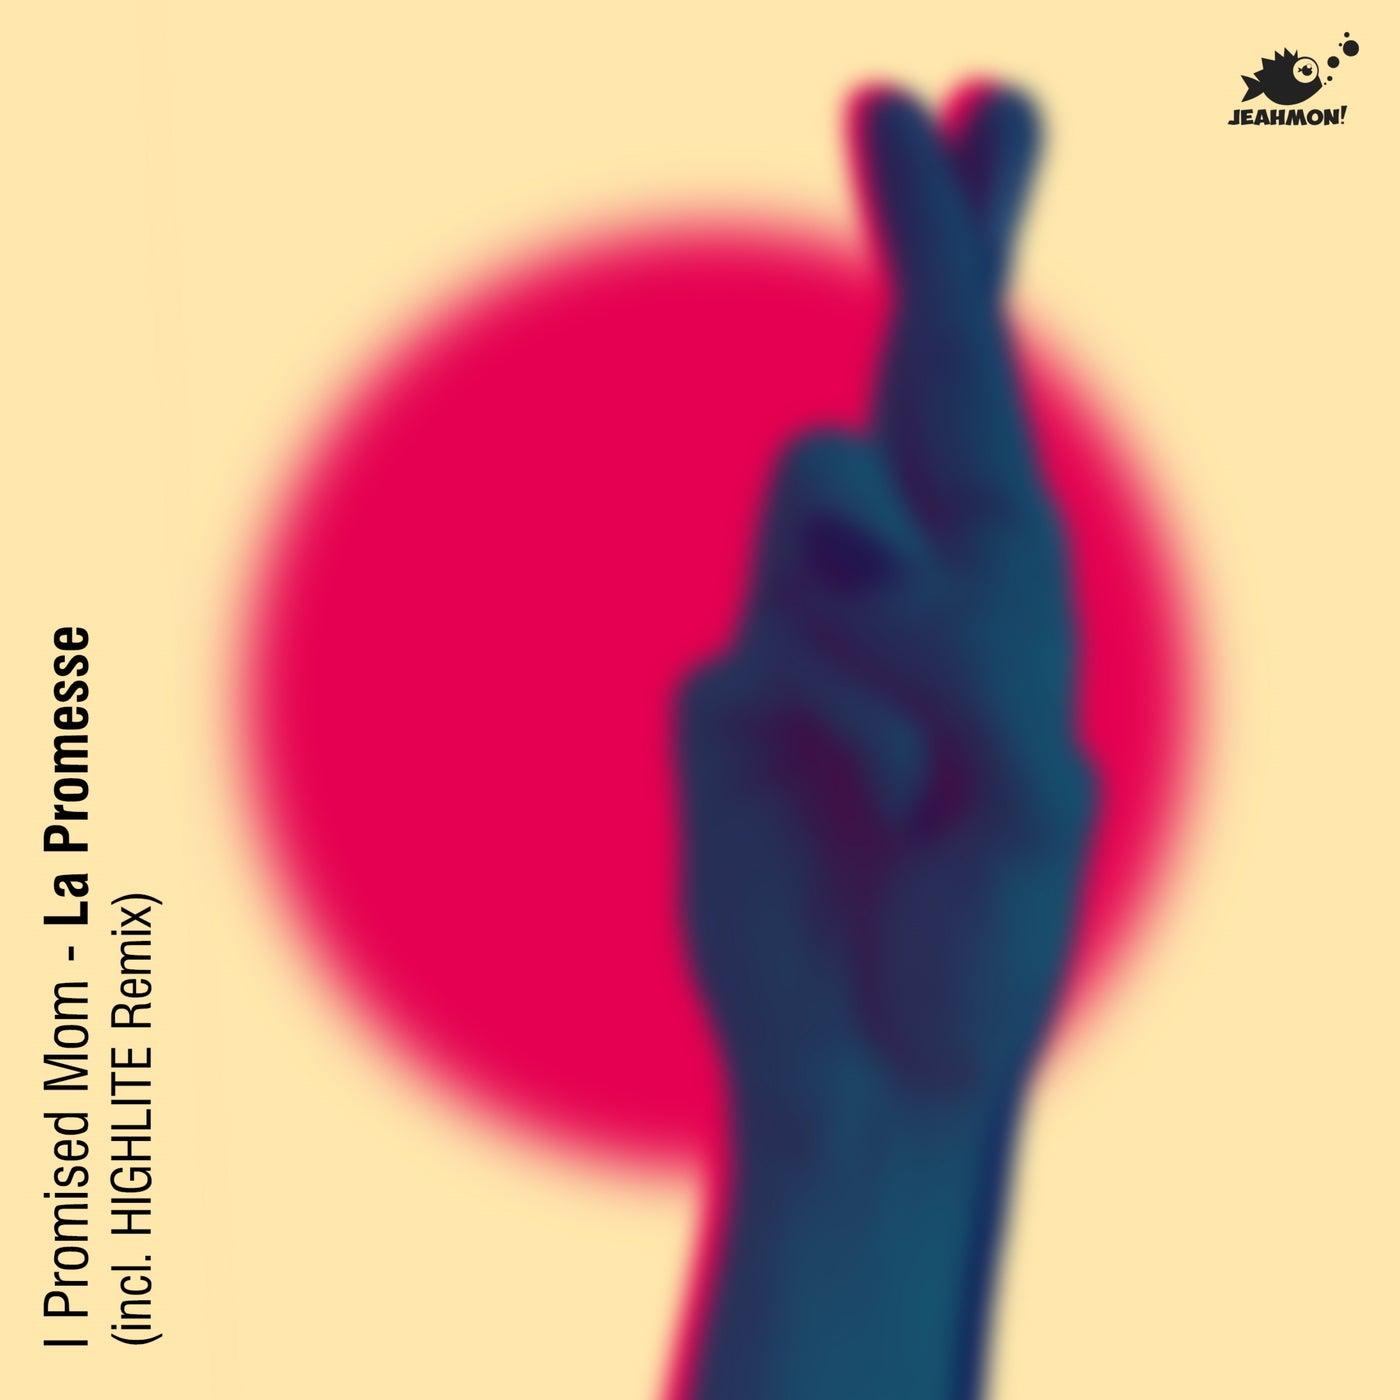 La Promesse feat. Angst Vor Greta (HIGHLITE Remix)